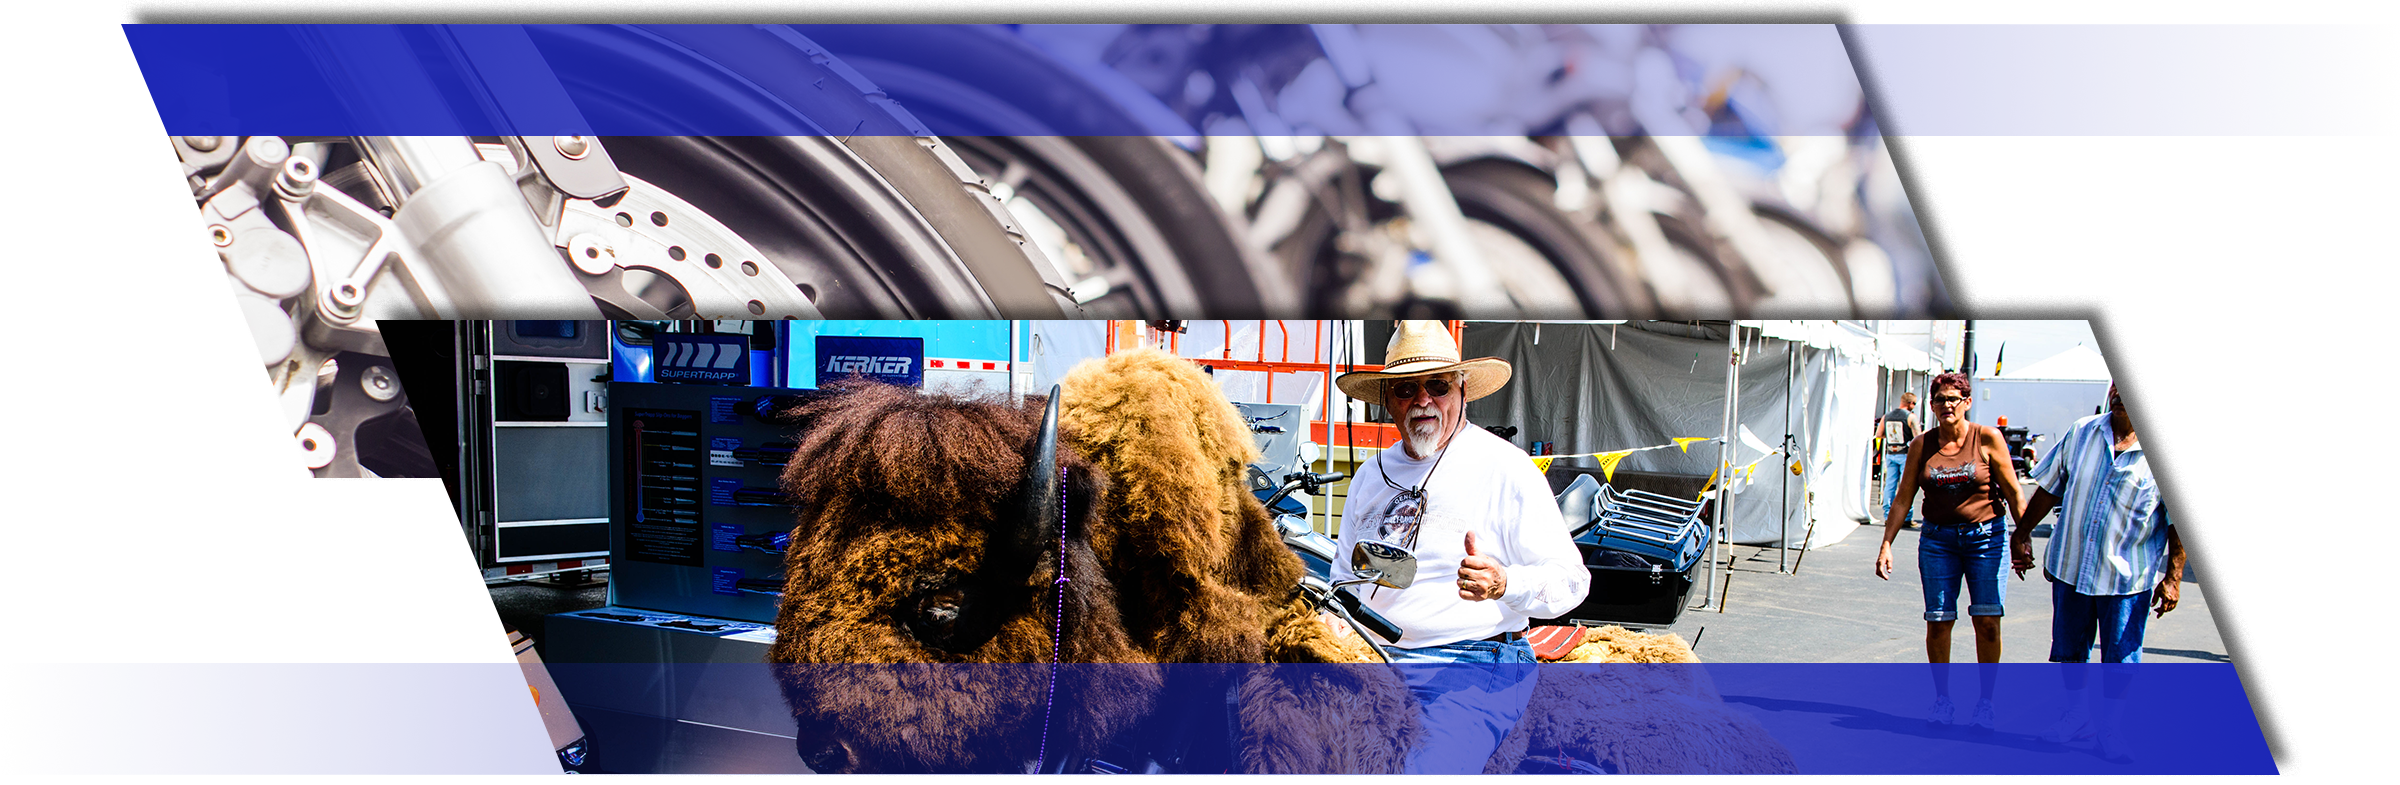 motorcycles man buffalo